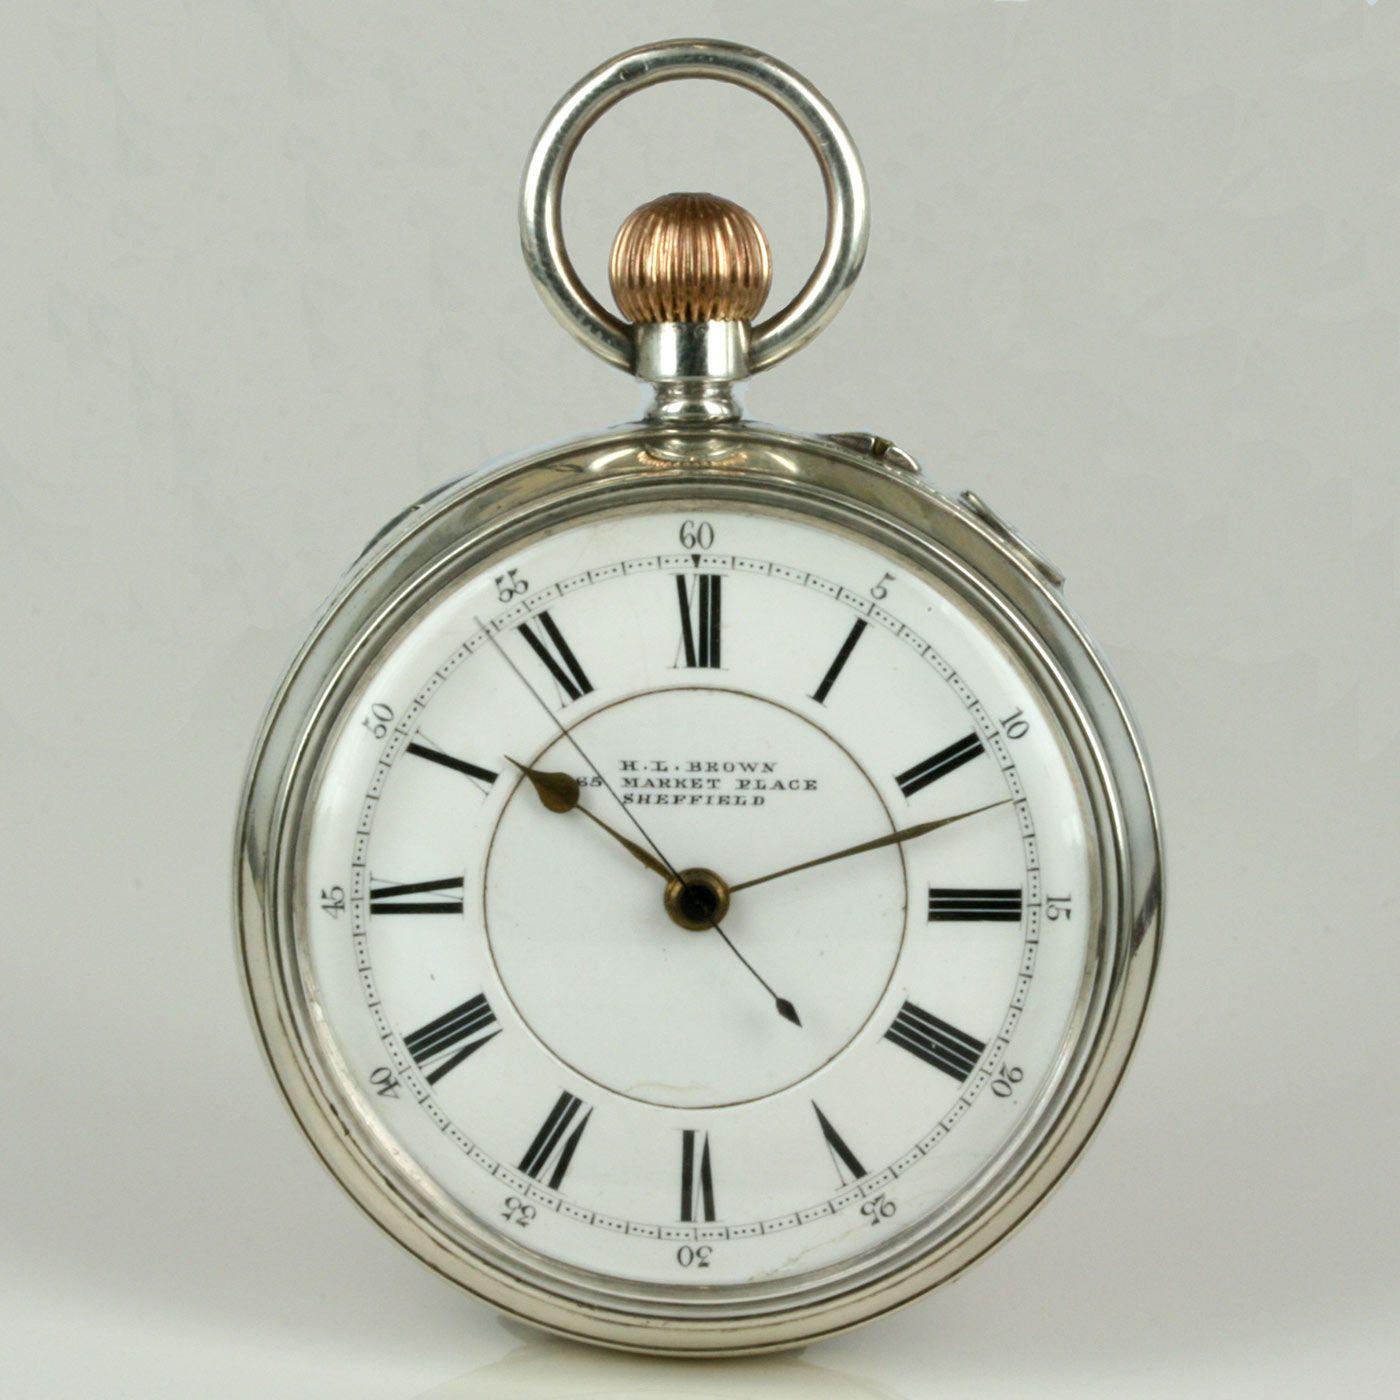 Antique pocket watch  Antique Pocket Watch | Old Watch | Pinterest | Pocket watch